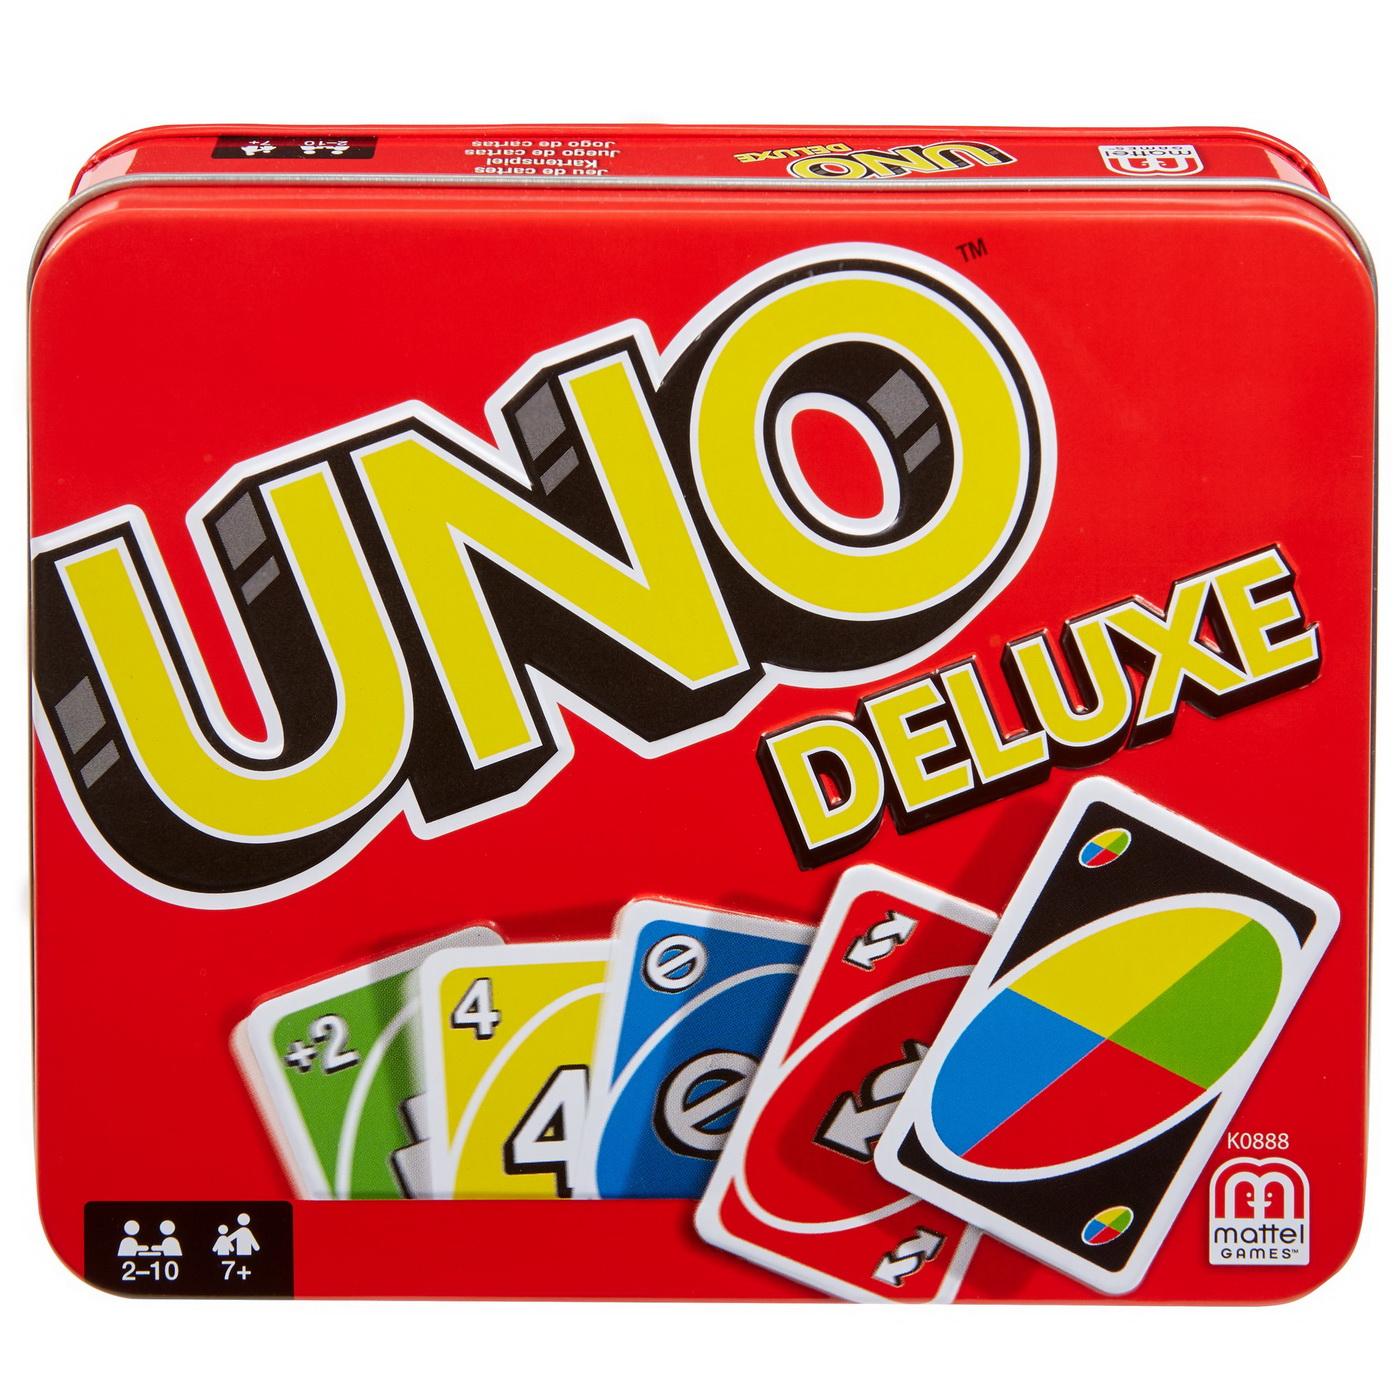 Carti De Joc Uno Deluxe